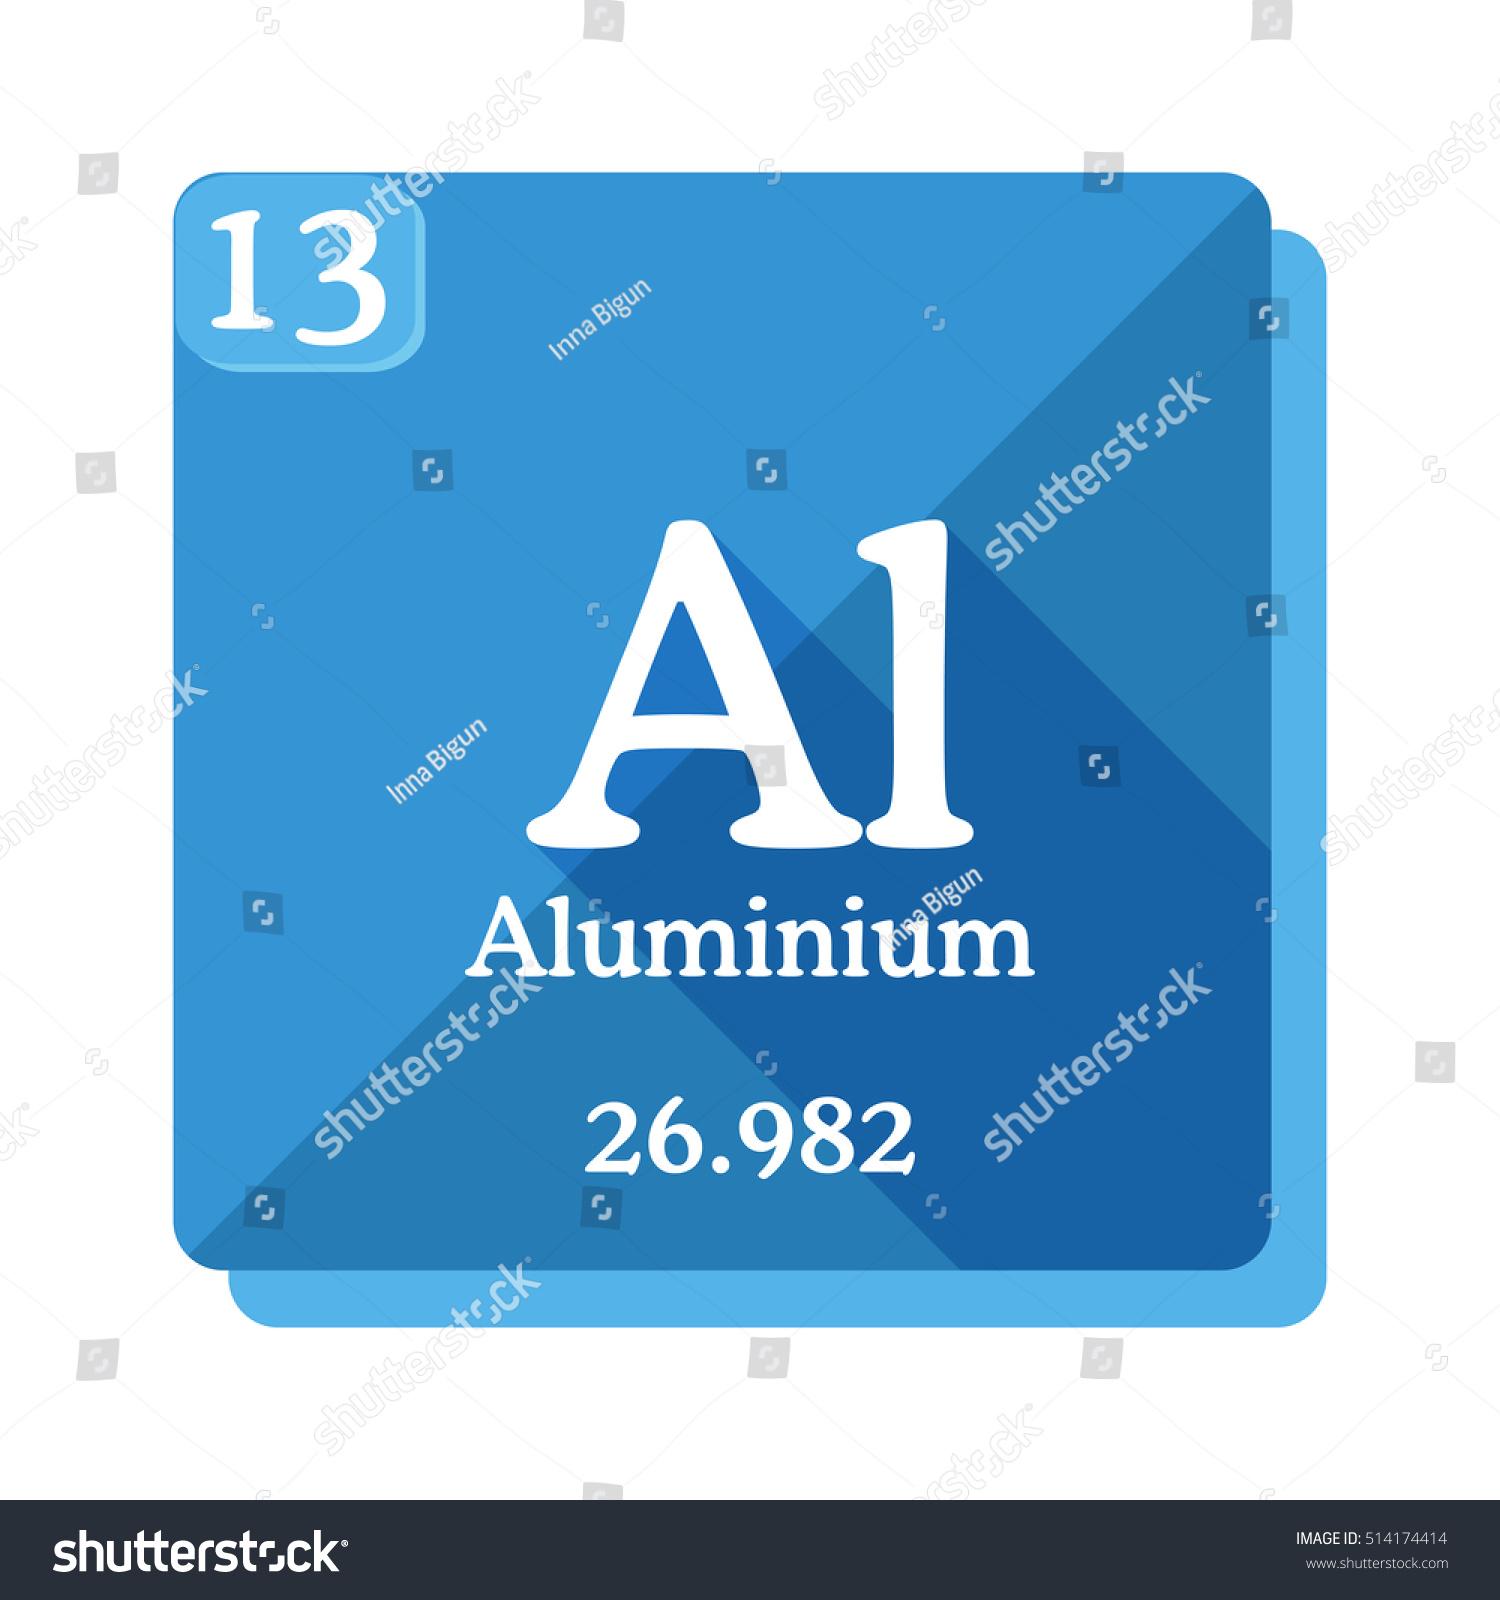 Aluminium al element periodic table vector stock vector 514174414 aluminium al element of the periodic table vector illustration in flat style gamestrikefo Choice Image